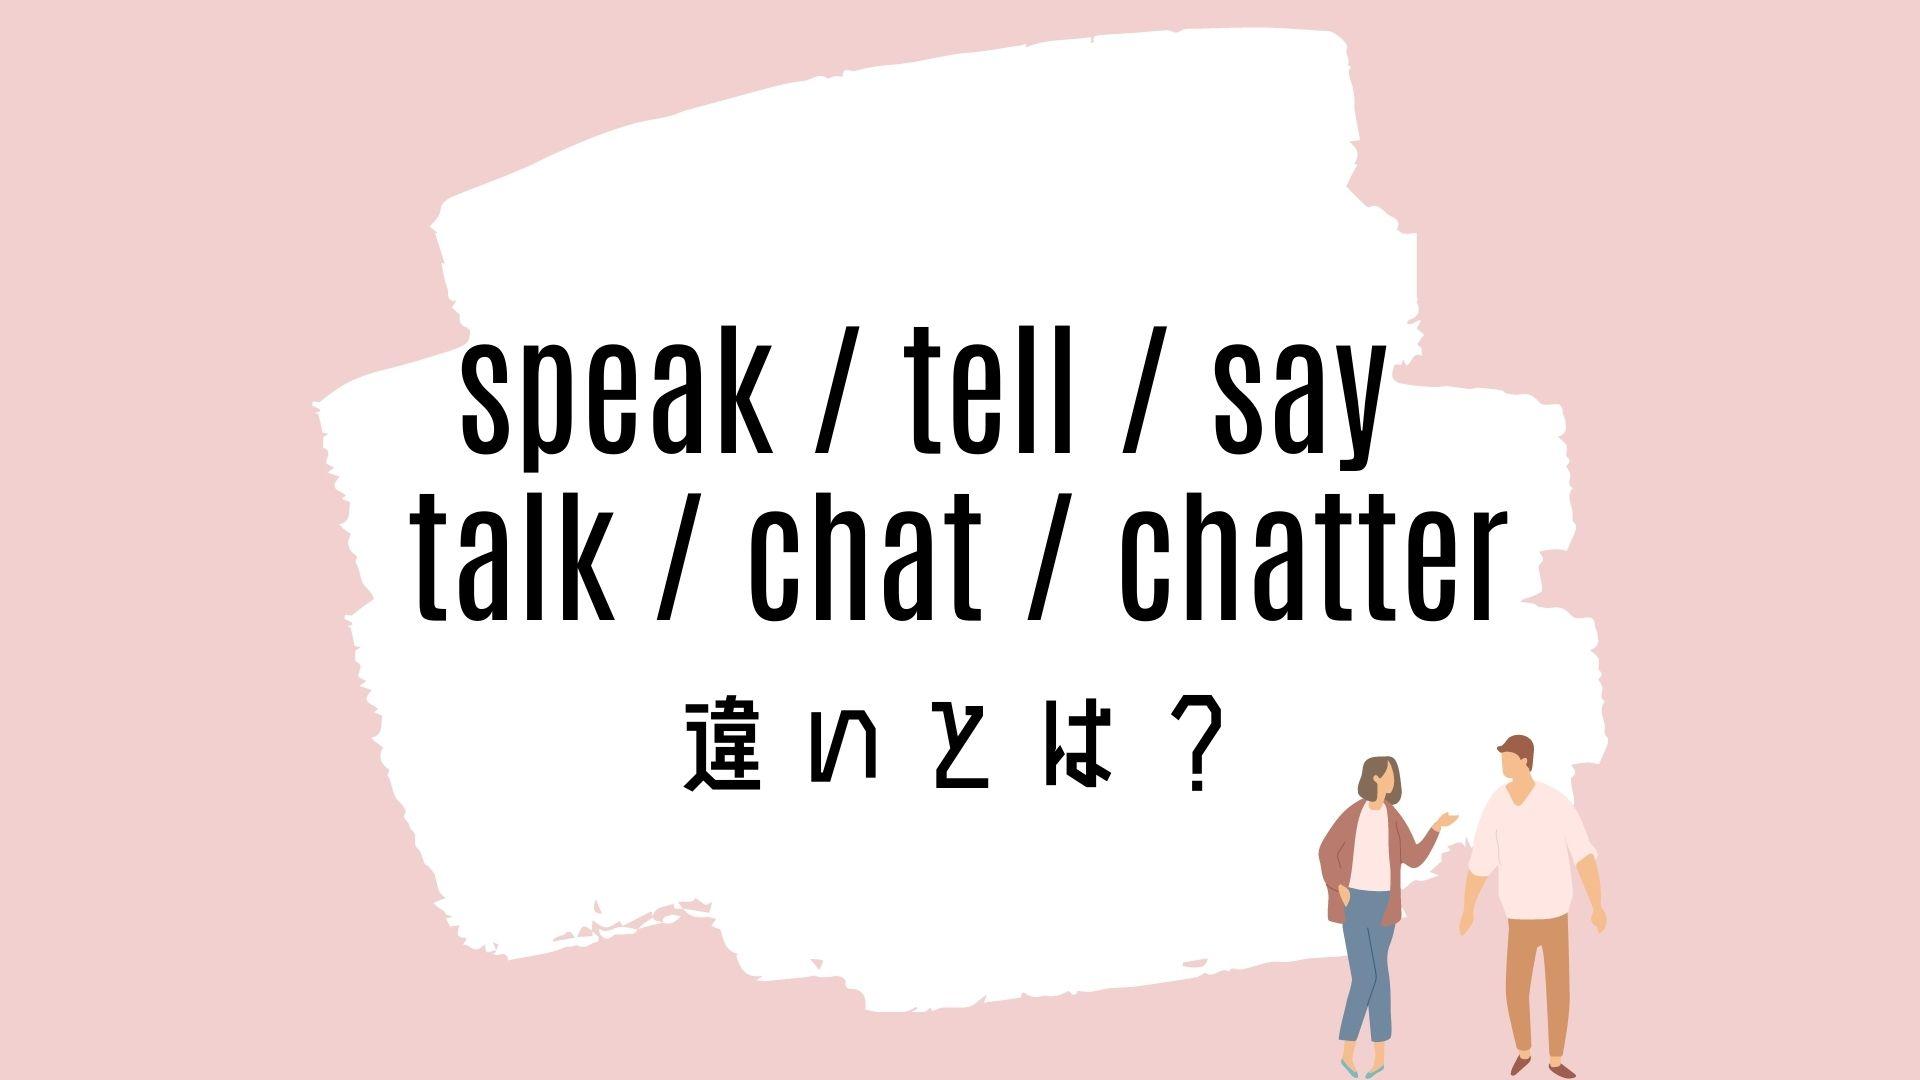 speak / tell / say / talk / chat / chatterの意味の違いとは?使い方を解説